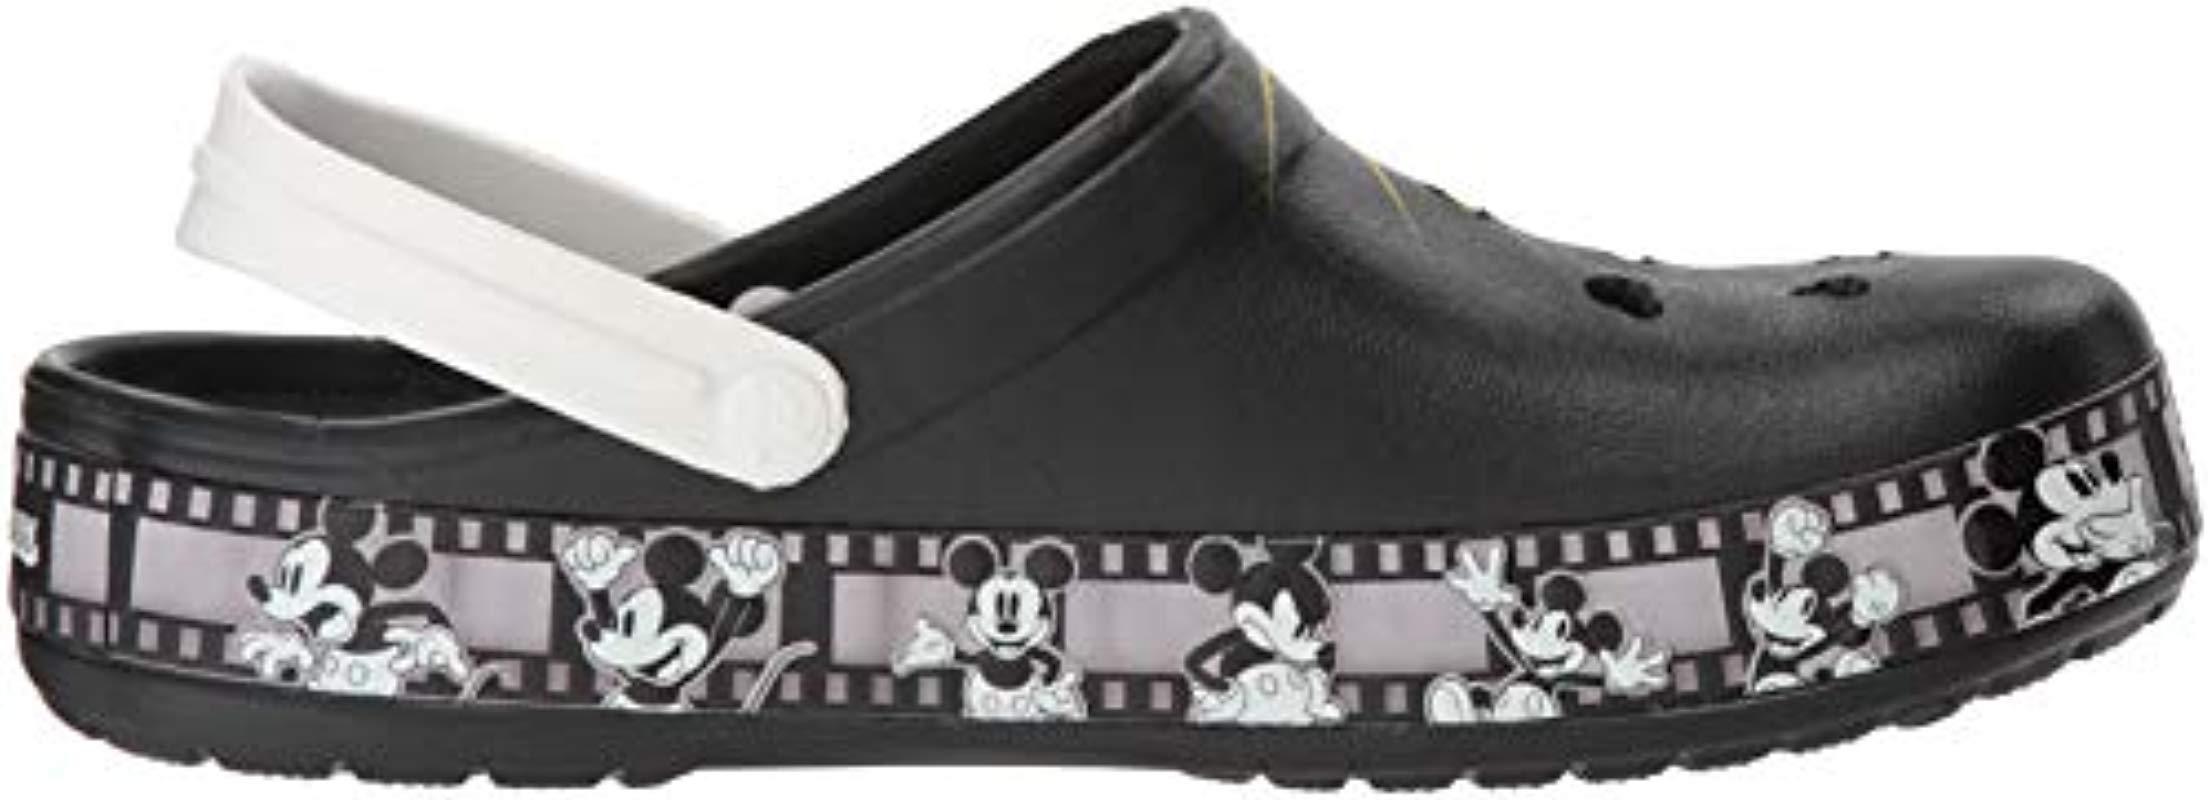 Crocs™ Crocband Mickey 90th Clog